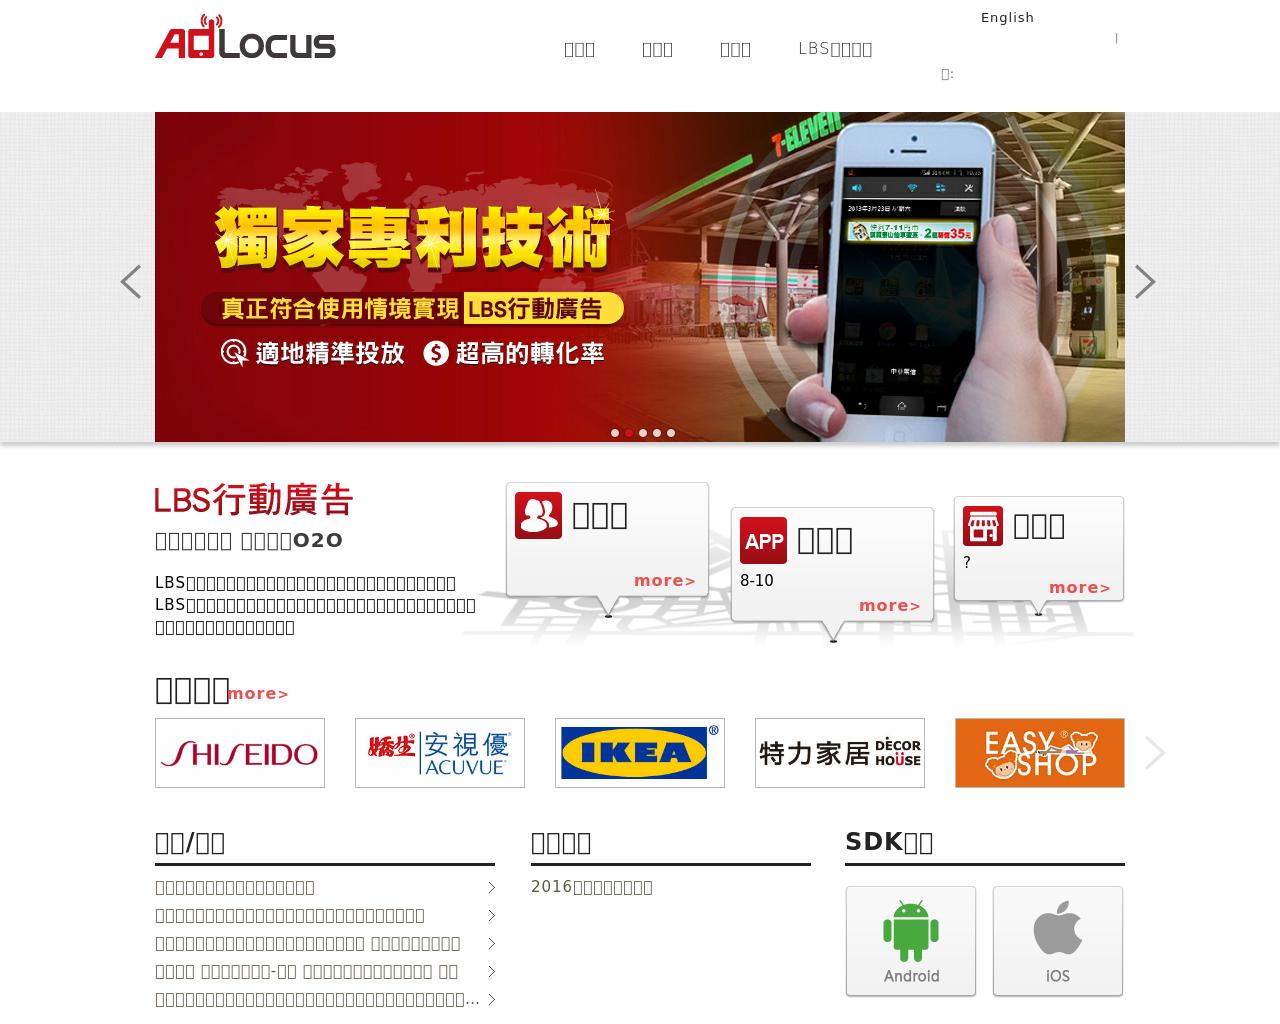 AdLocus-Advertising-Reviews-Pricing